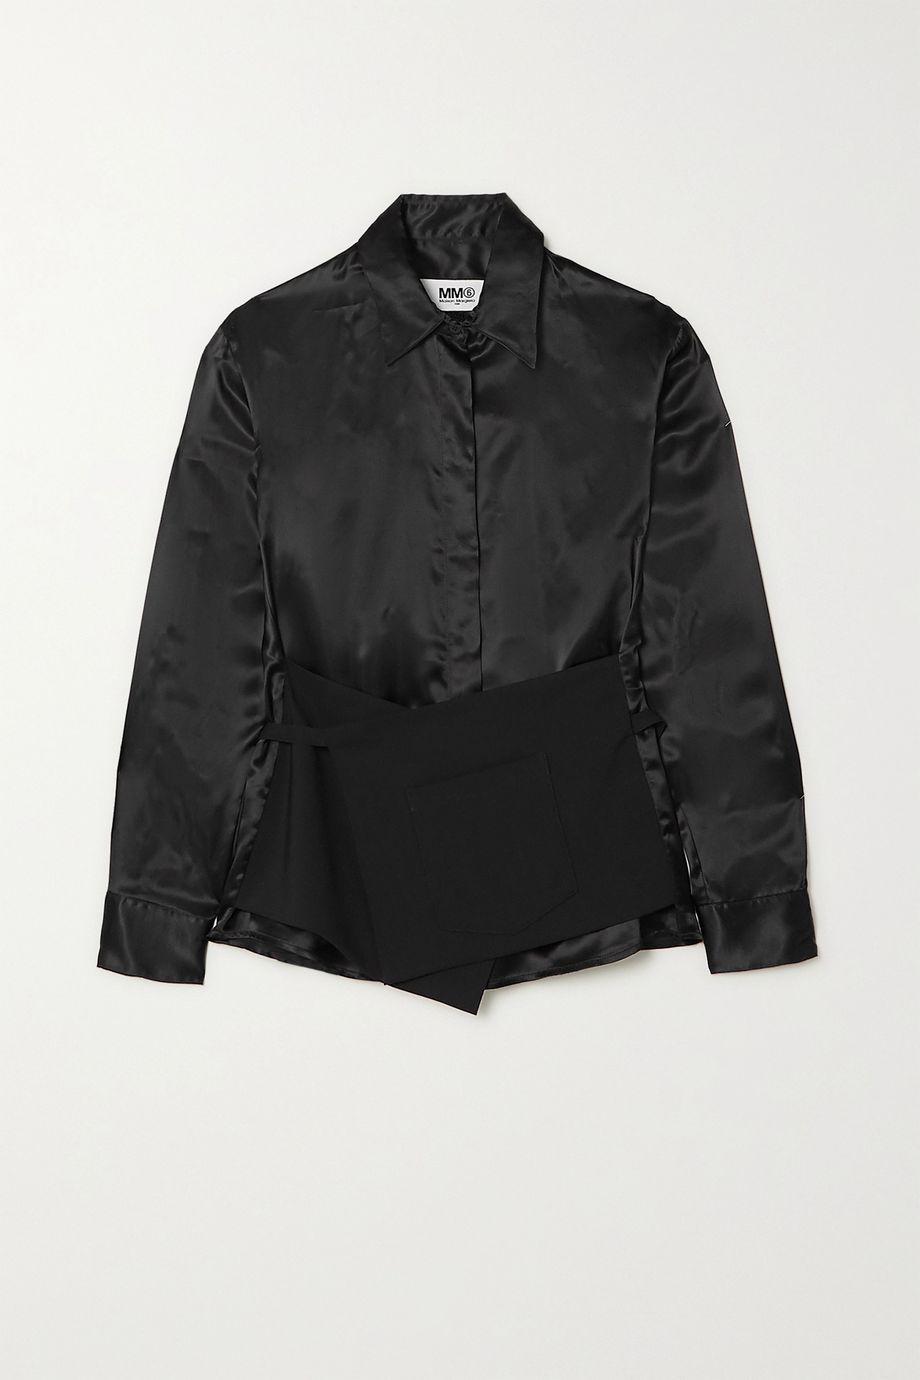 MM6 Maison Margiela Layered wool and charmeuse shirt